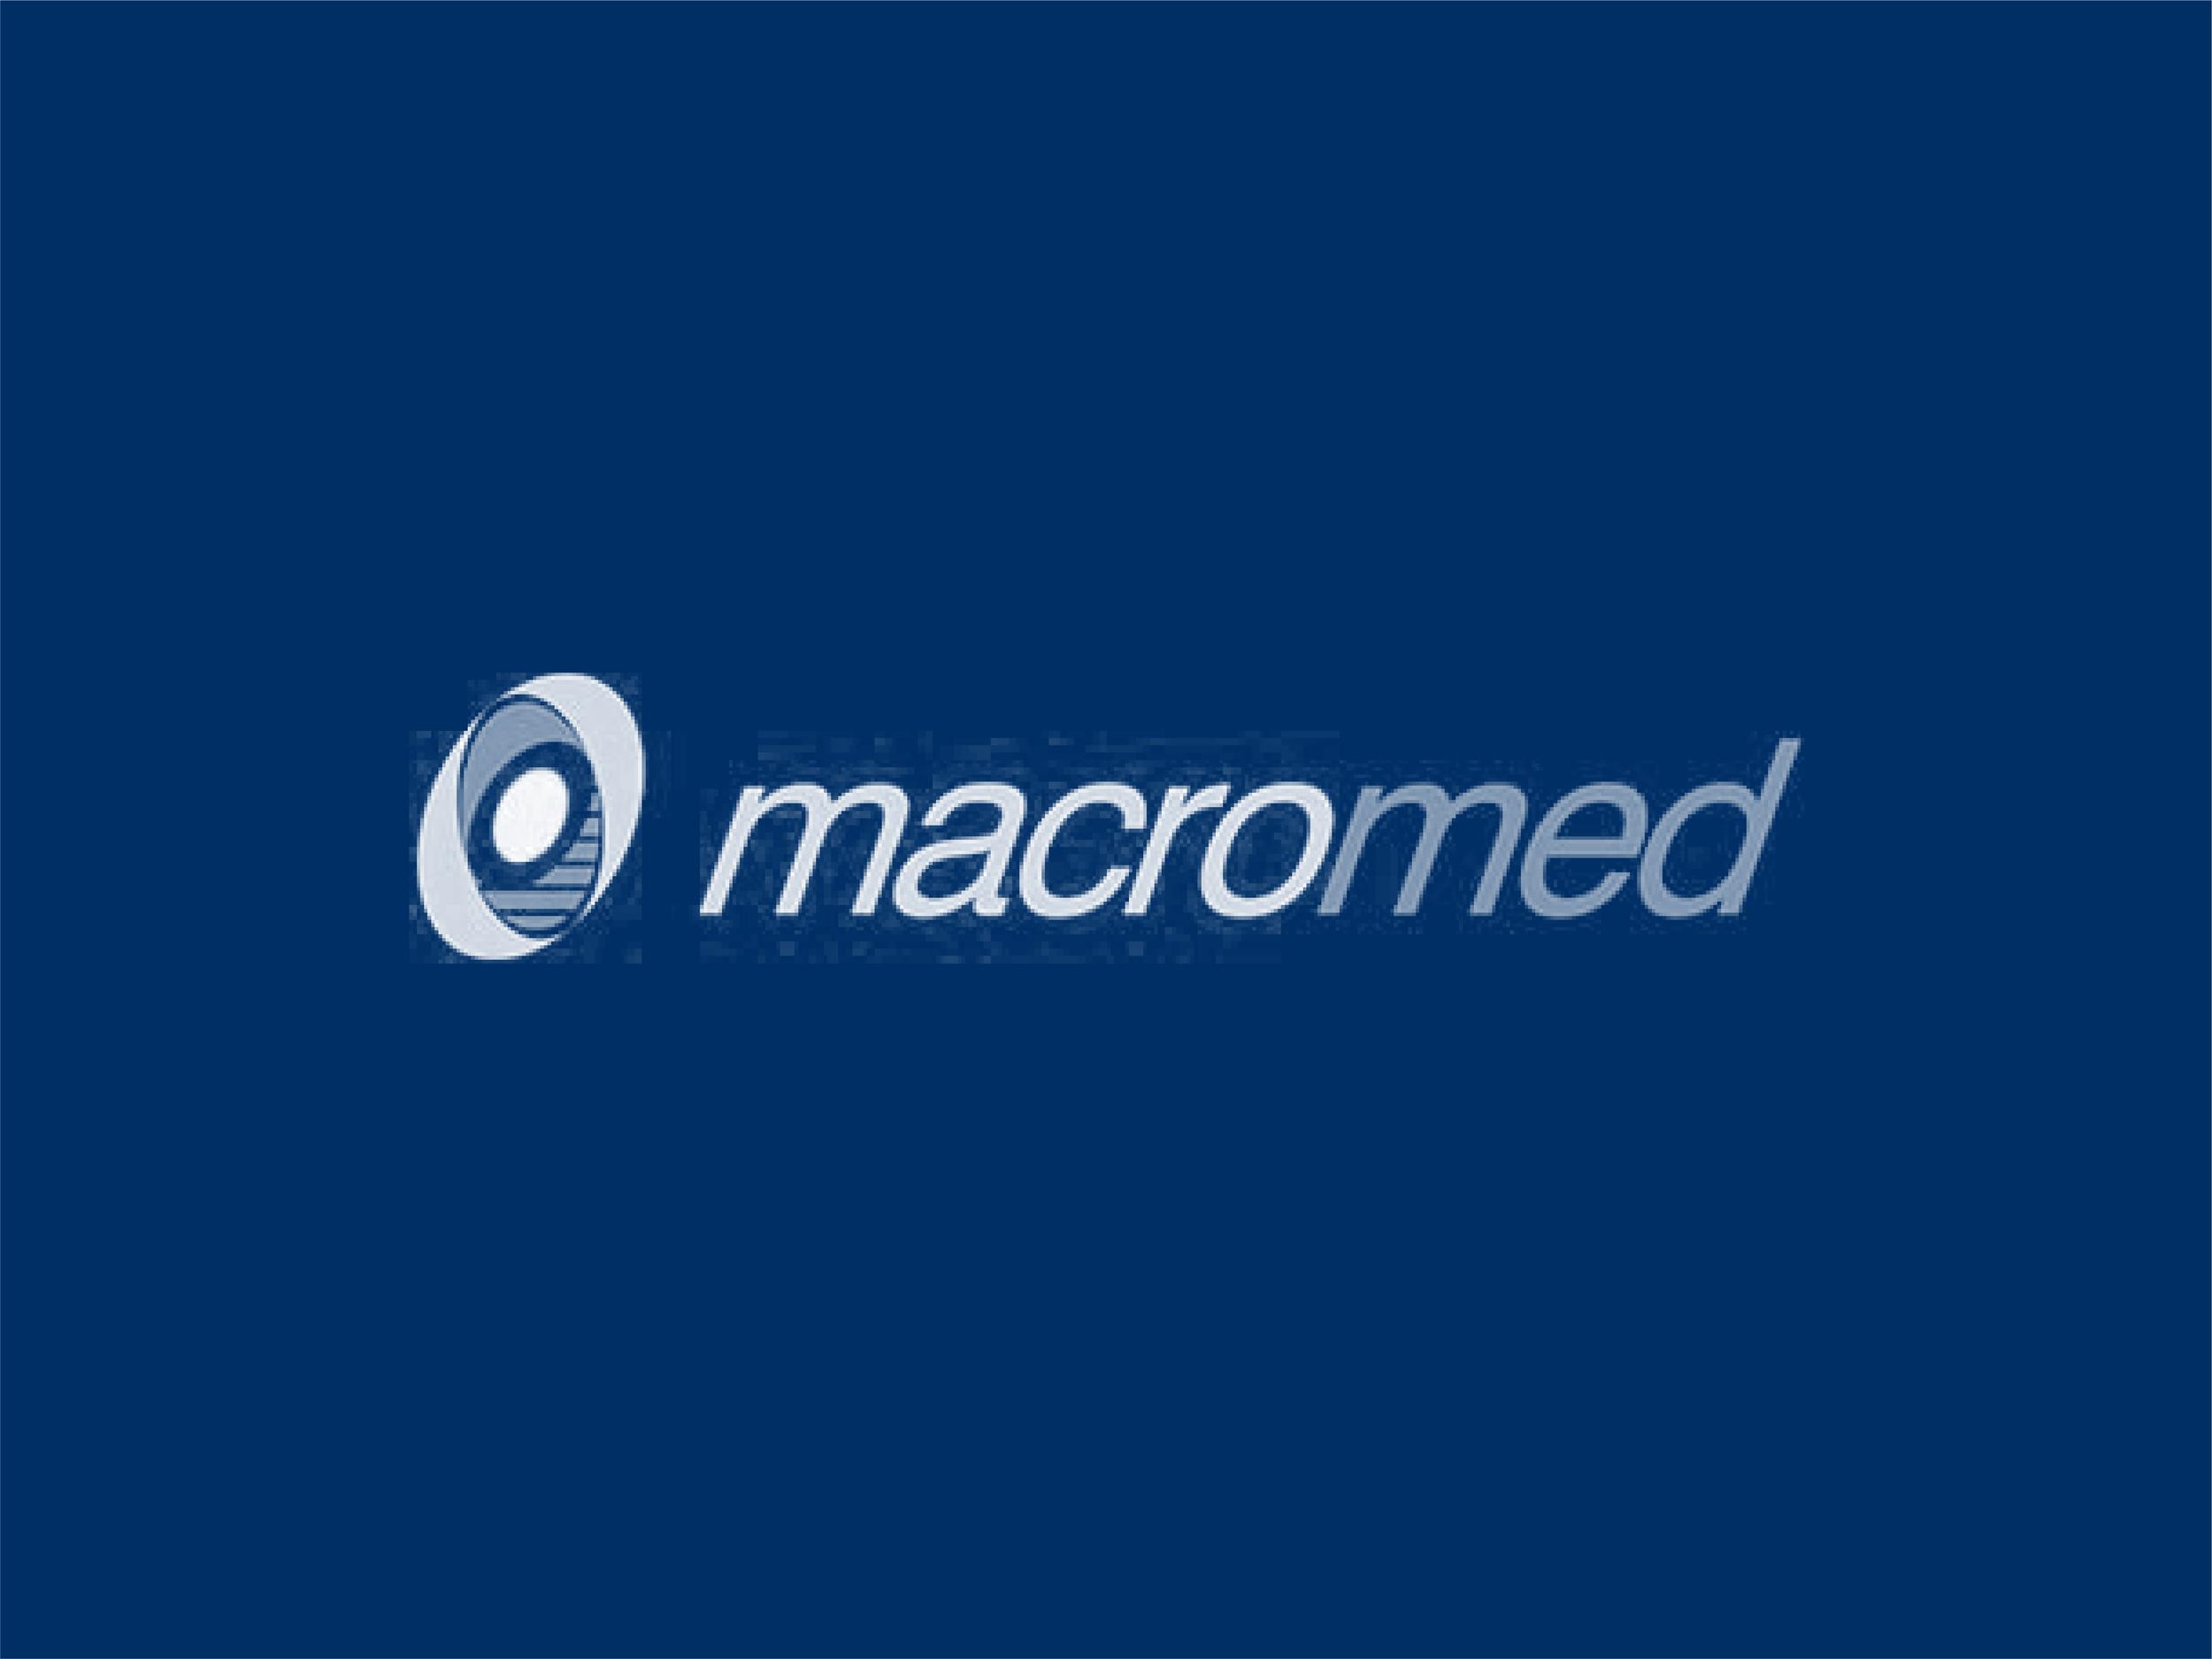 Macromed - Acquisition of Macromed on behalf of Uniphar plc